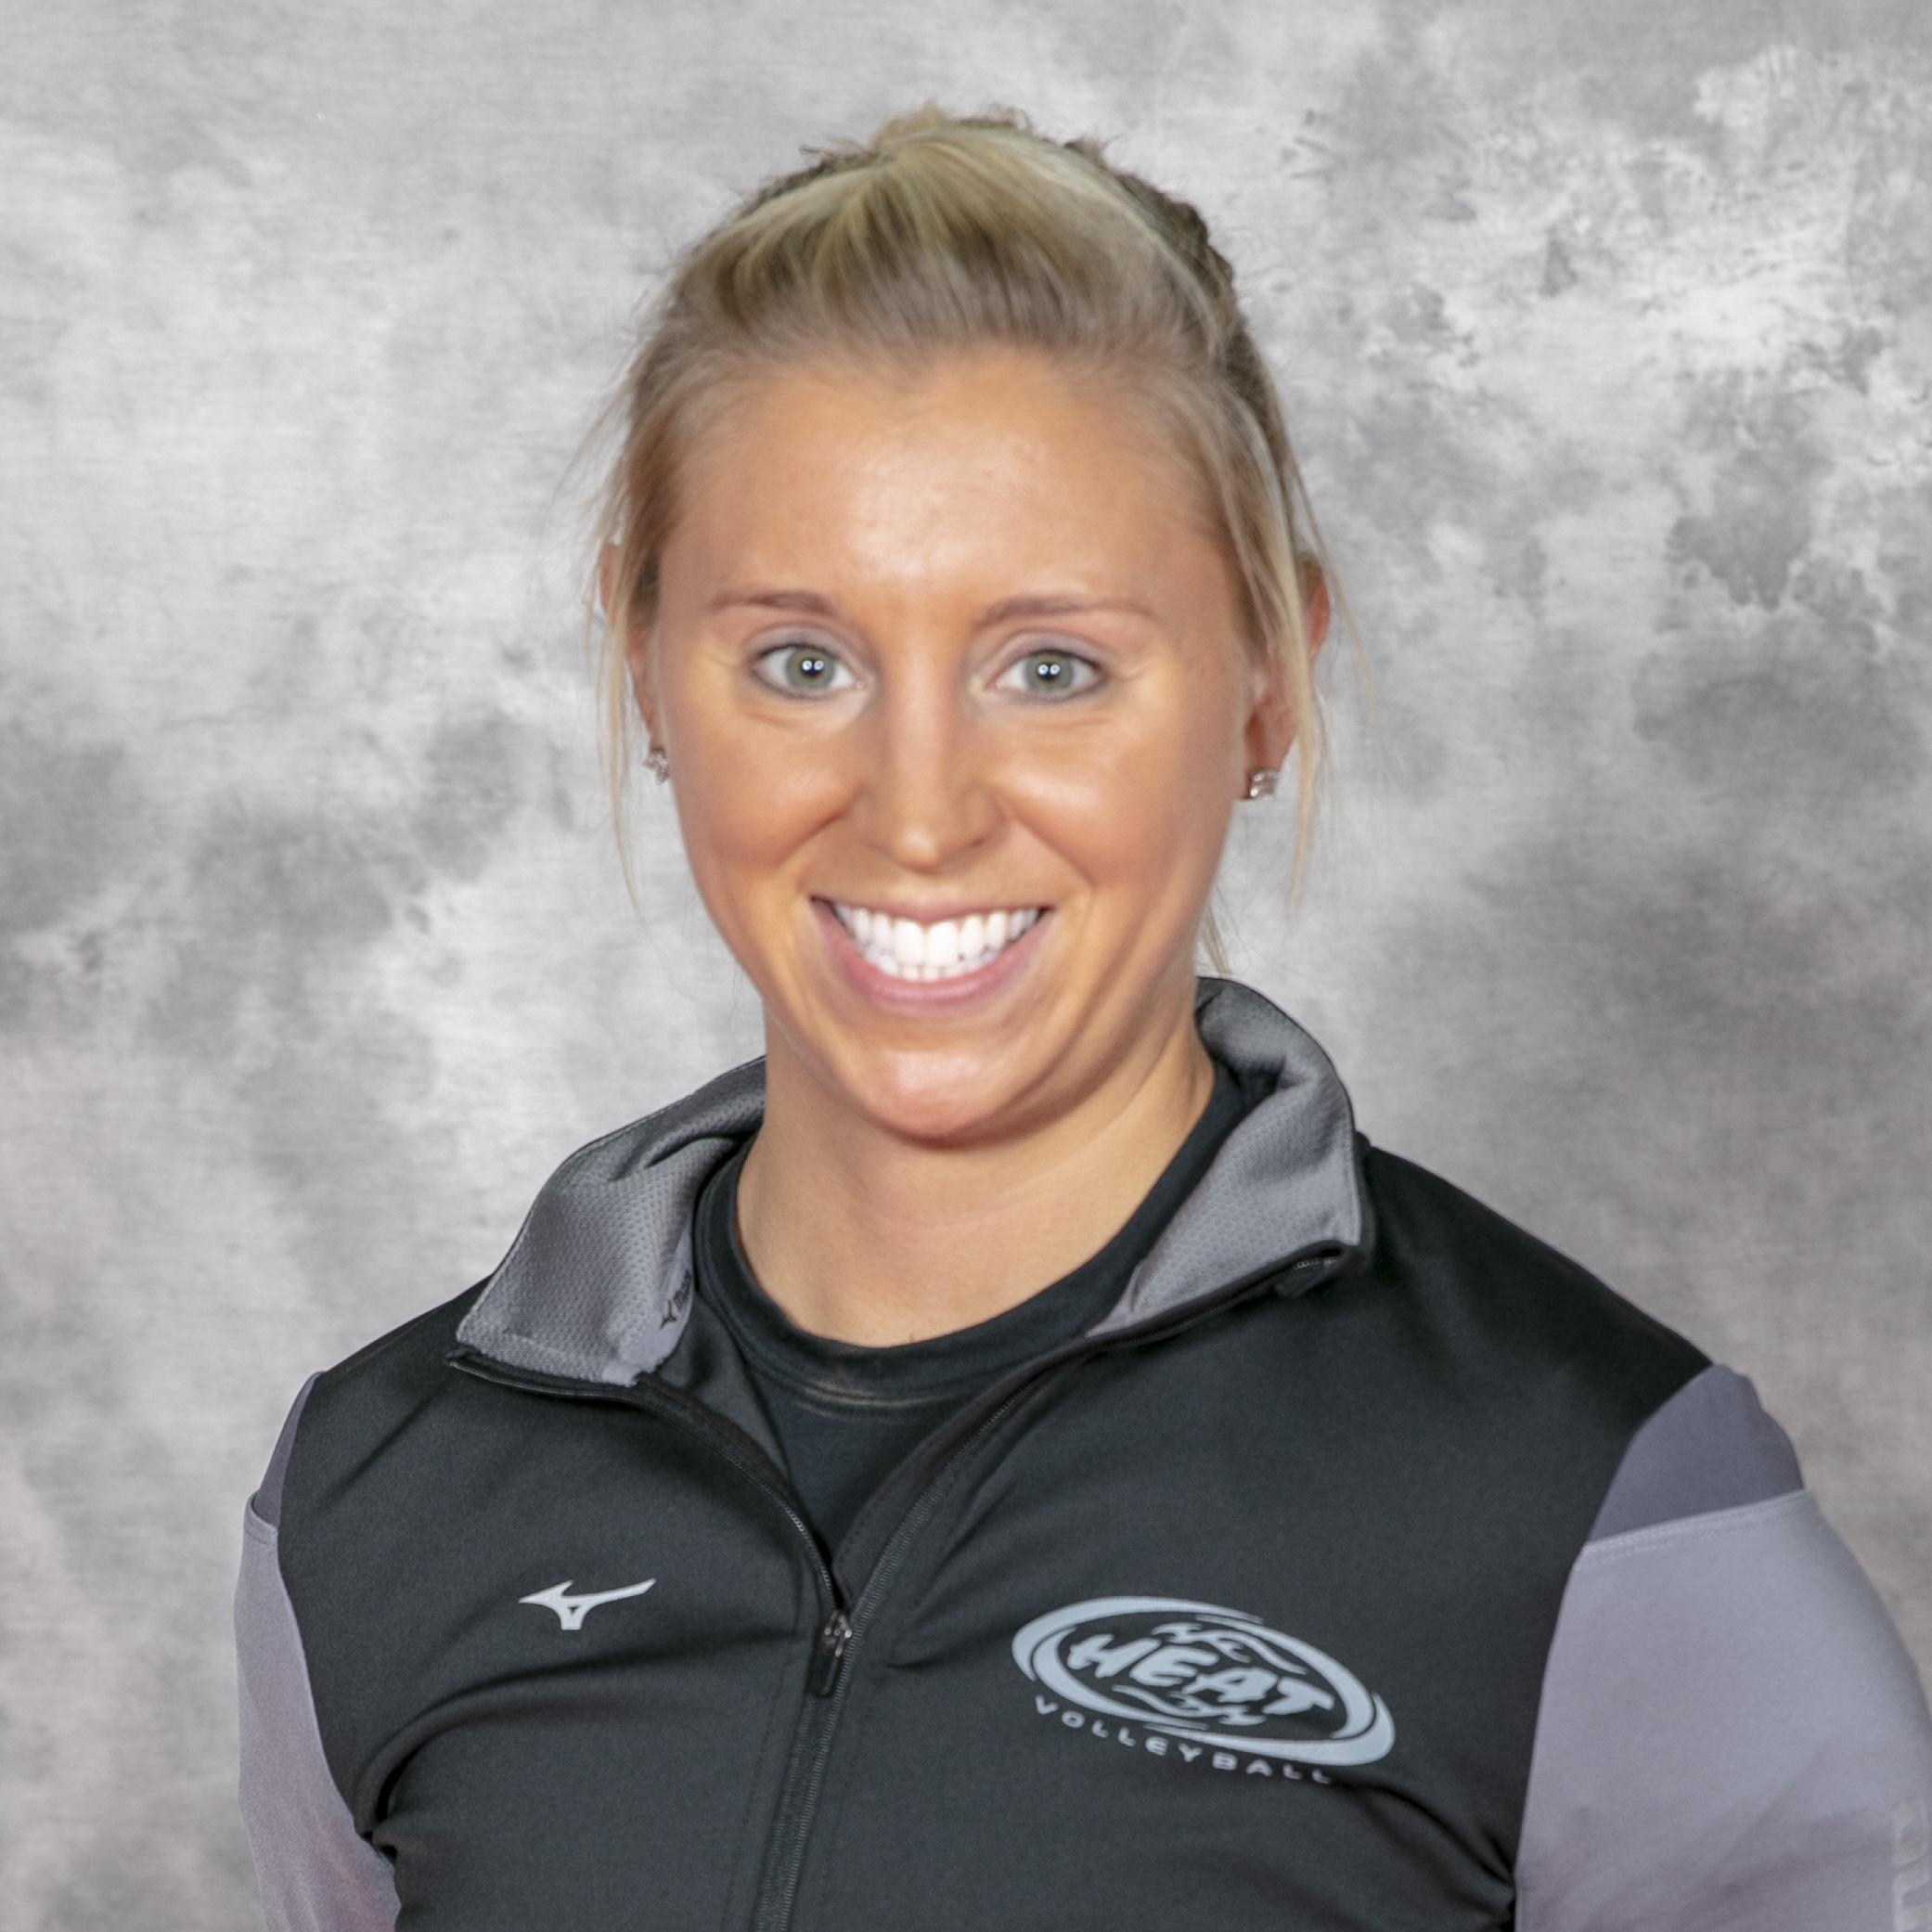 Alisha (Laing) Peters : Coach